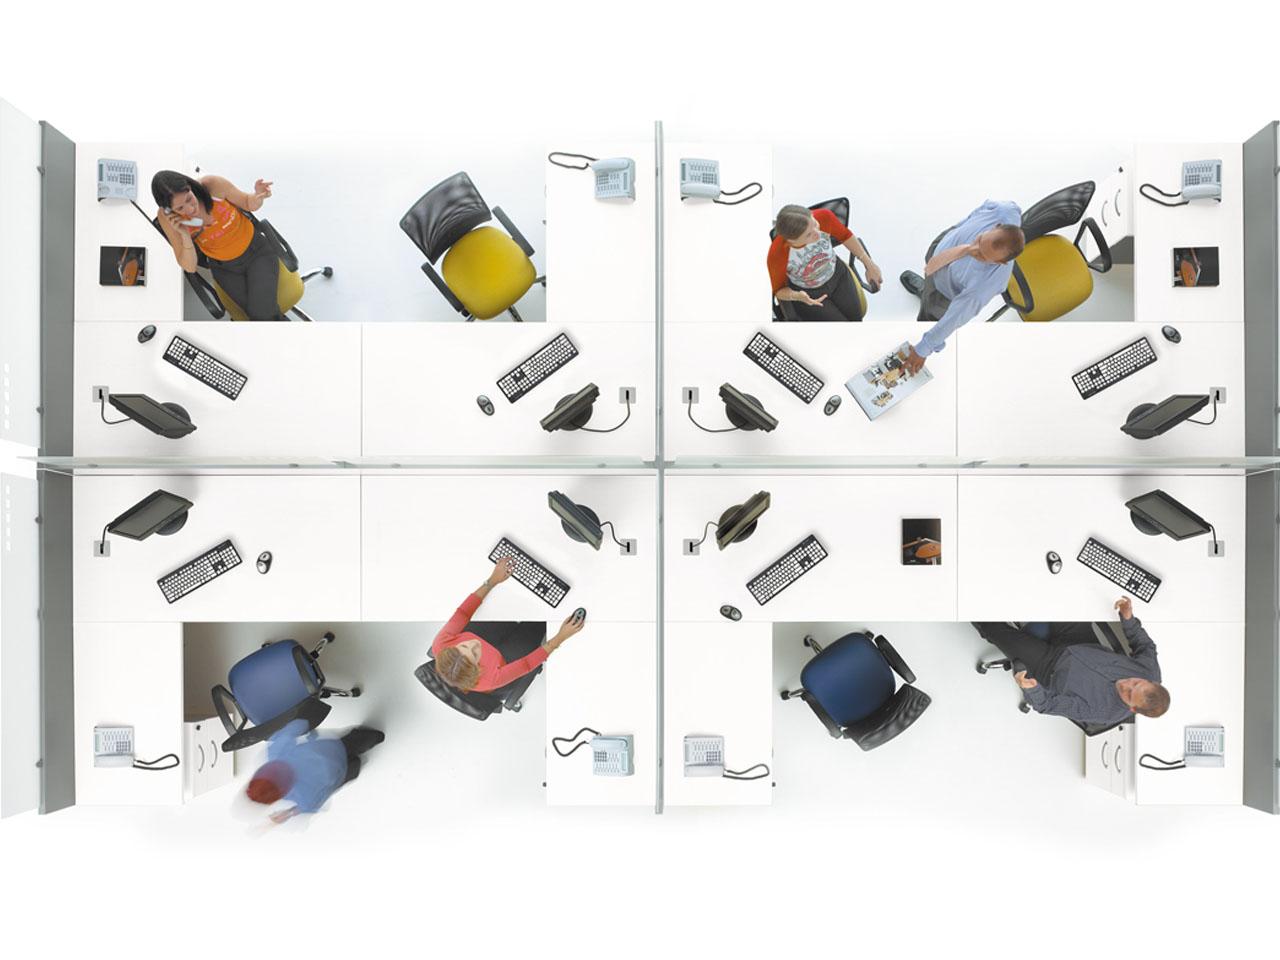 Mesas altas de oficina ergonom a hilarious porn for Xxx en la oficina